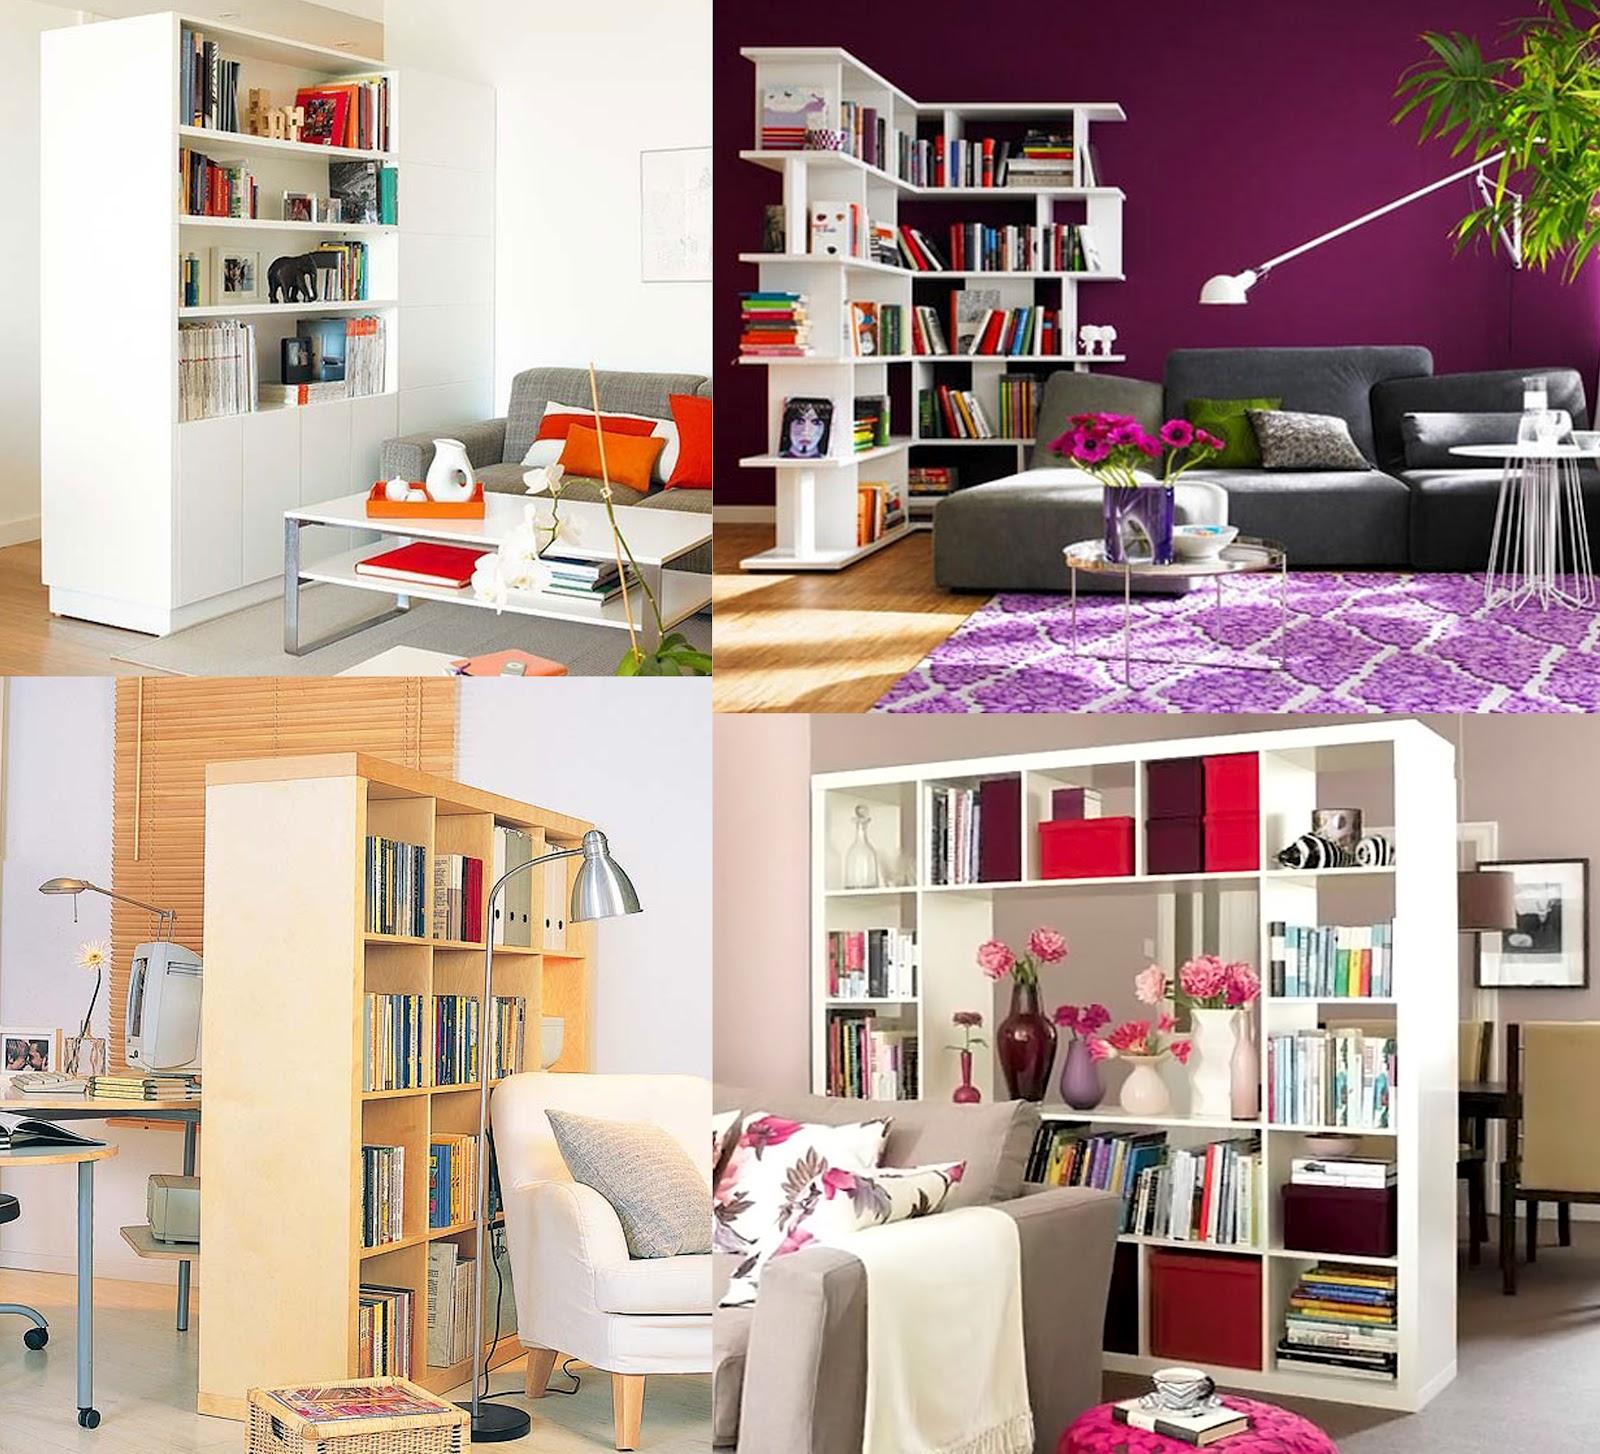 Дизайн квартиры. Красивый дизайн и декор интерьера